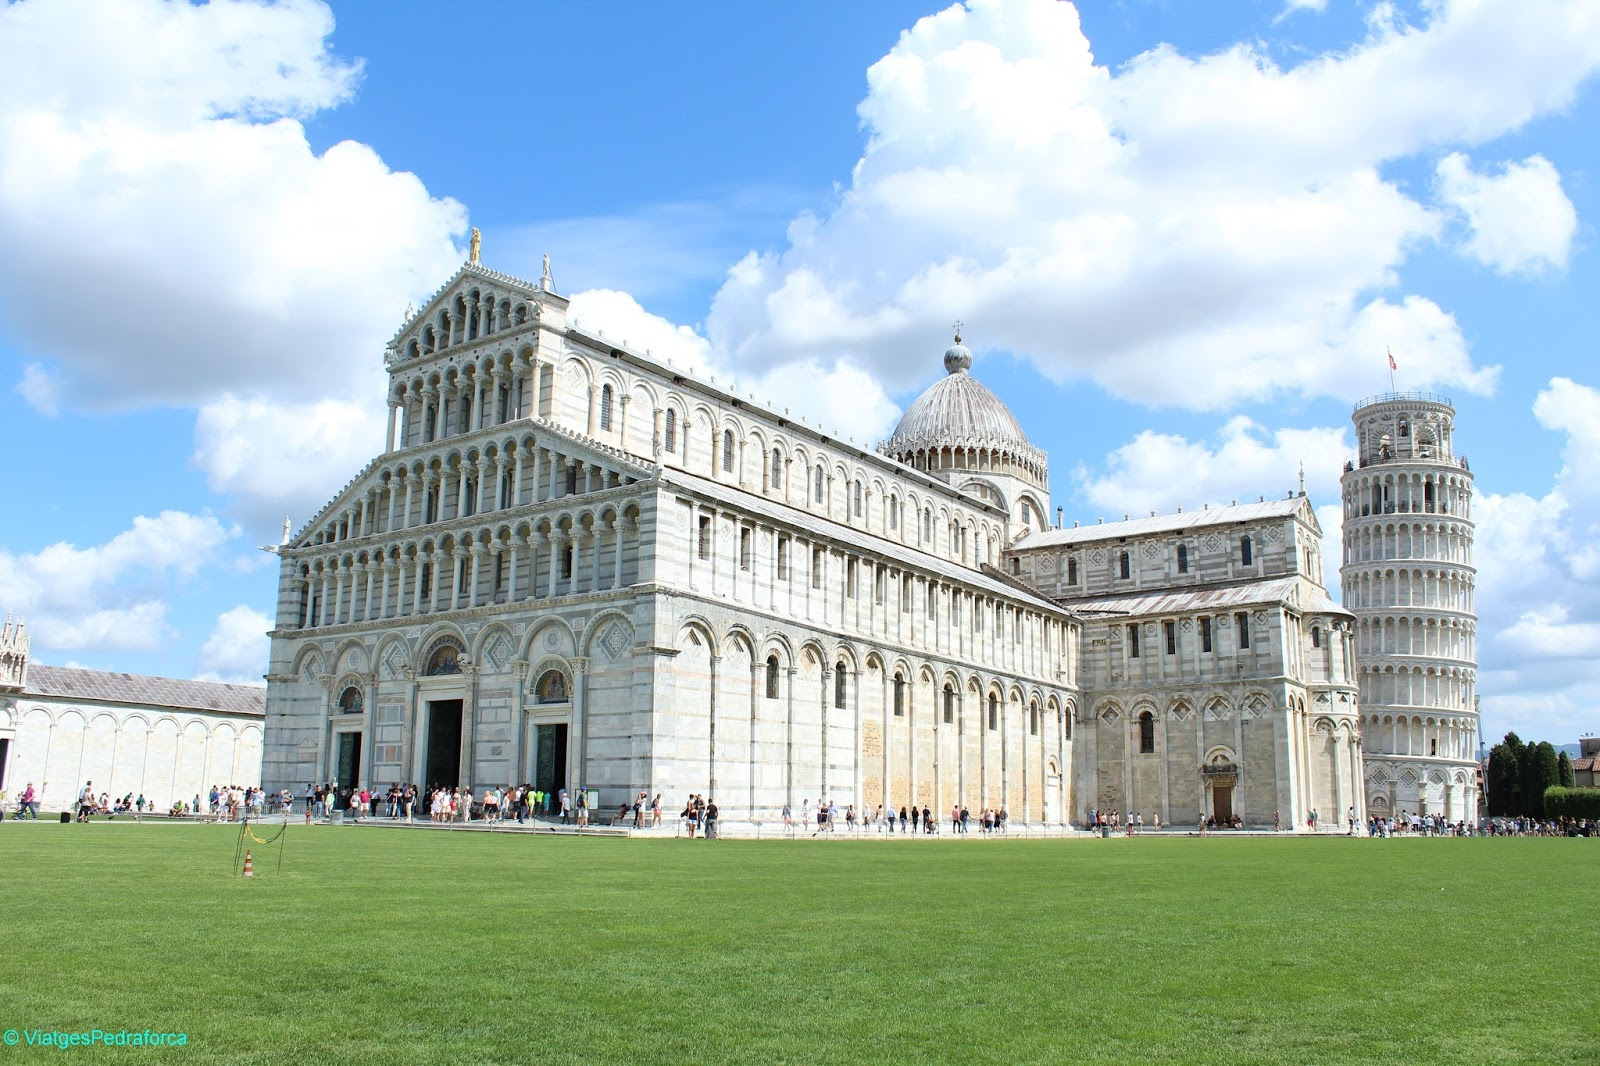 Catedral de Pisa, Toscana, Torre Pendente, Art romànica, Itàlia